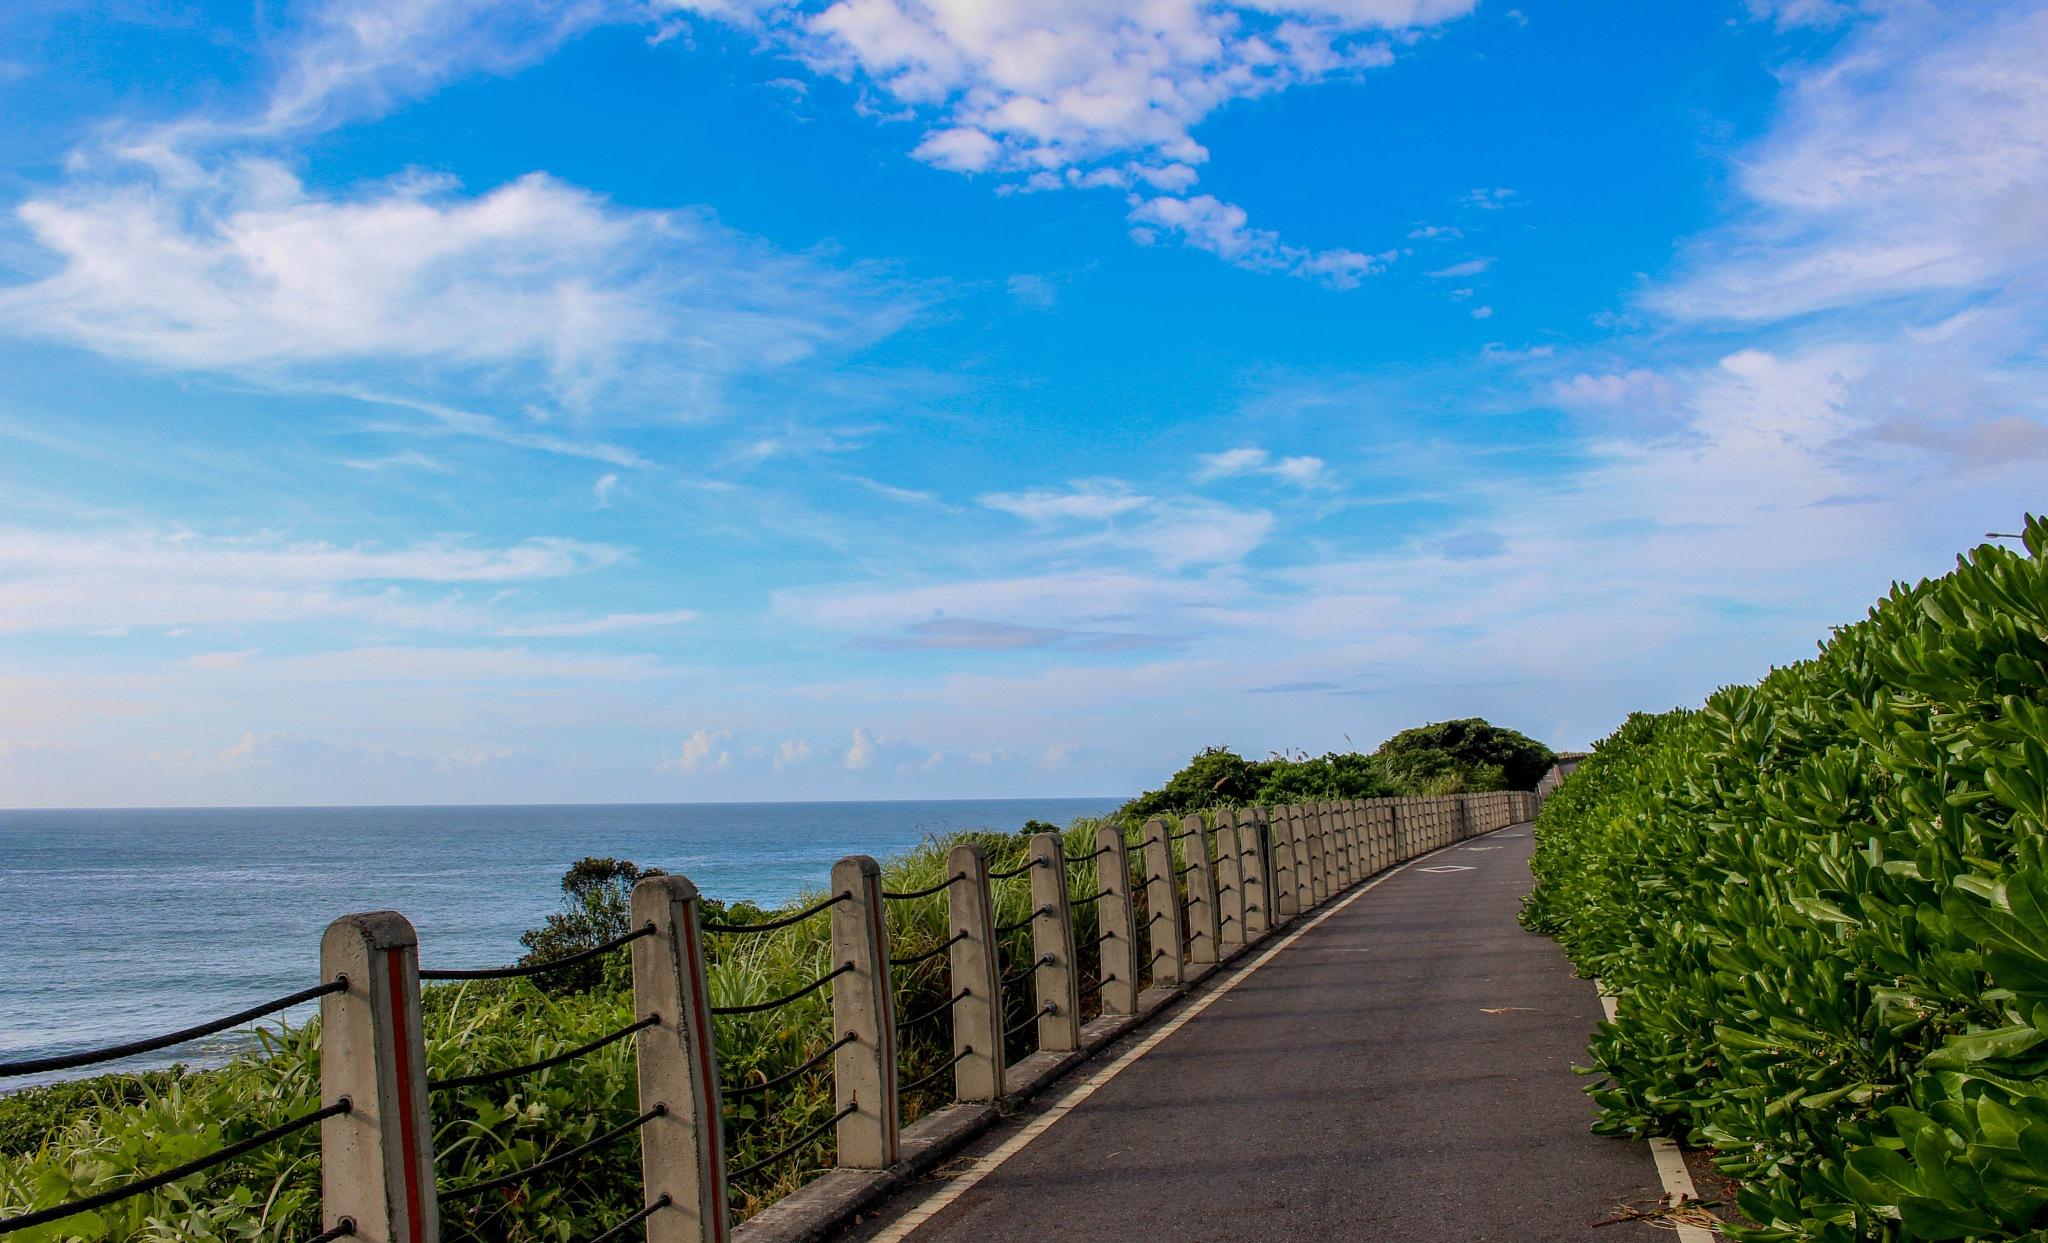 Beach Side Cycling by tamilkumarancse